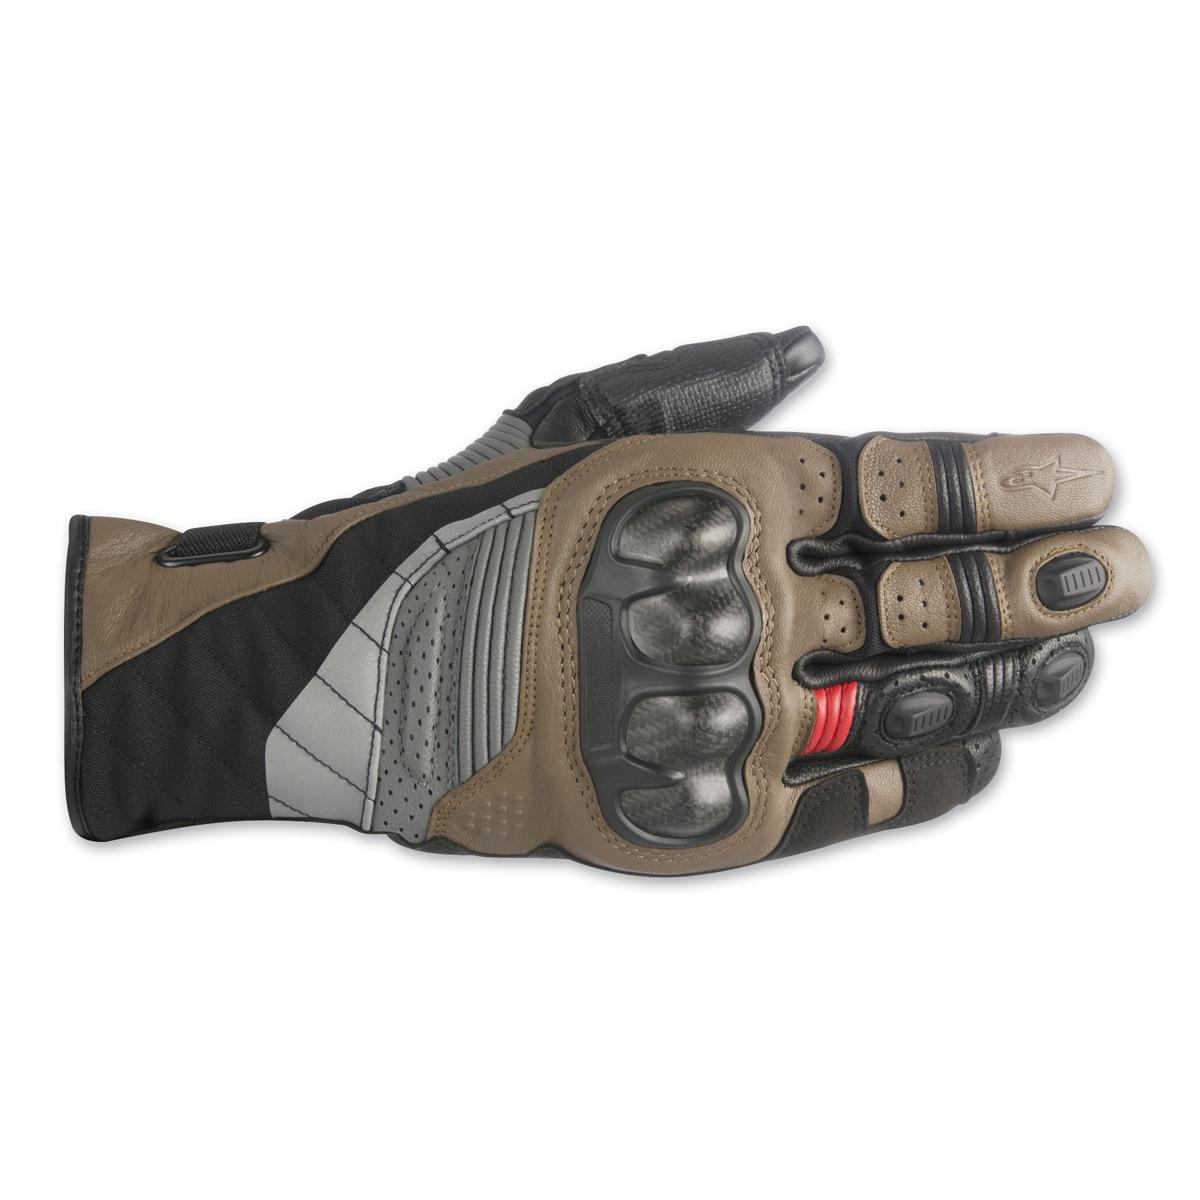 Alpinestars Men's Belize Drystar Black/Brown/ Red Gloves